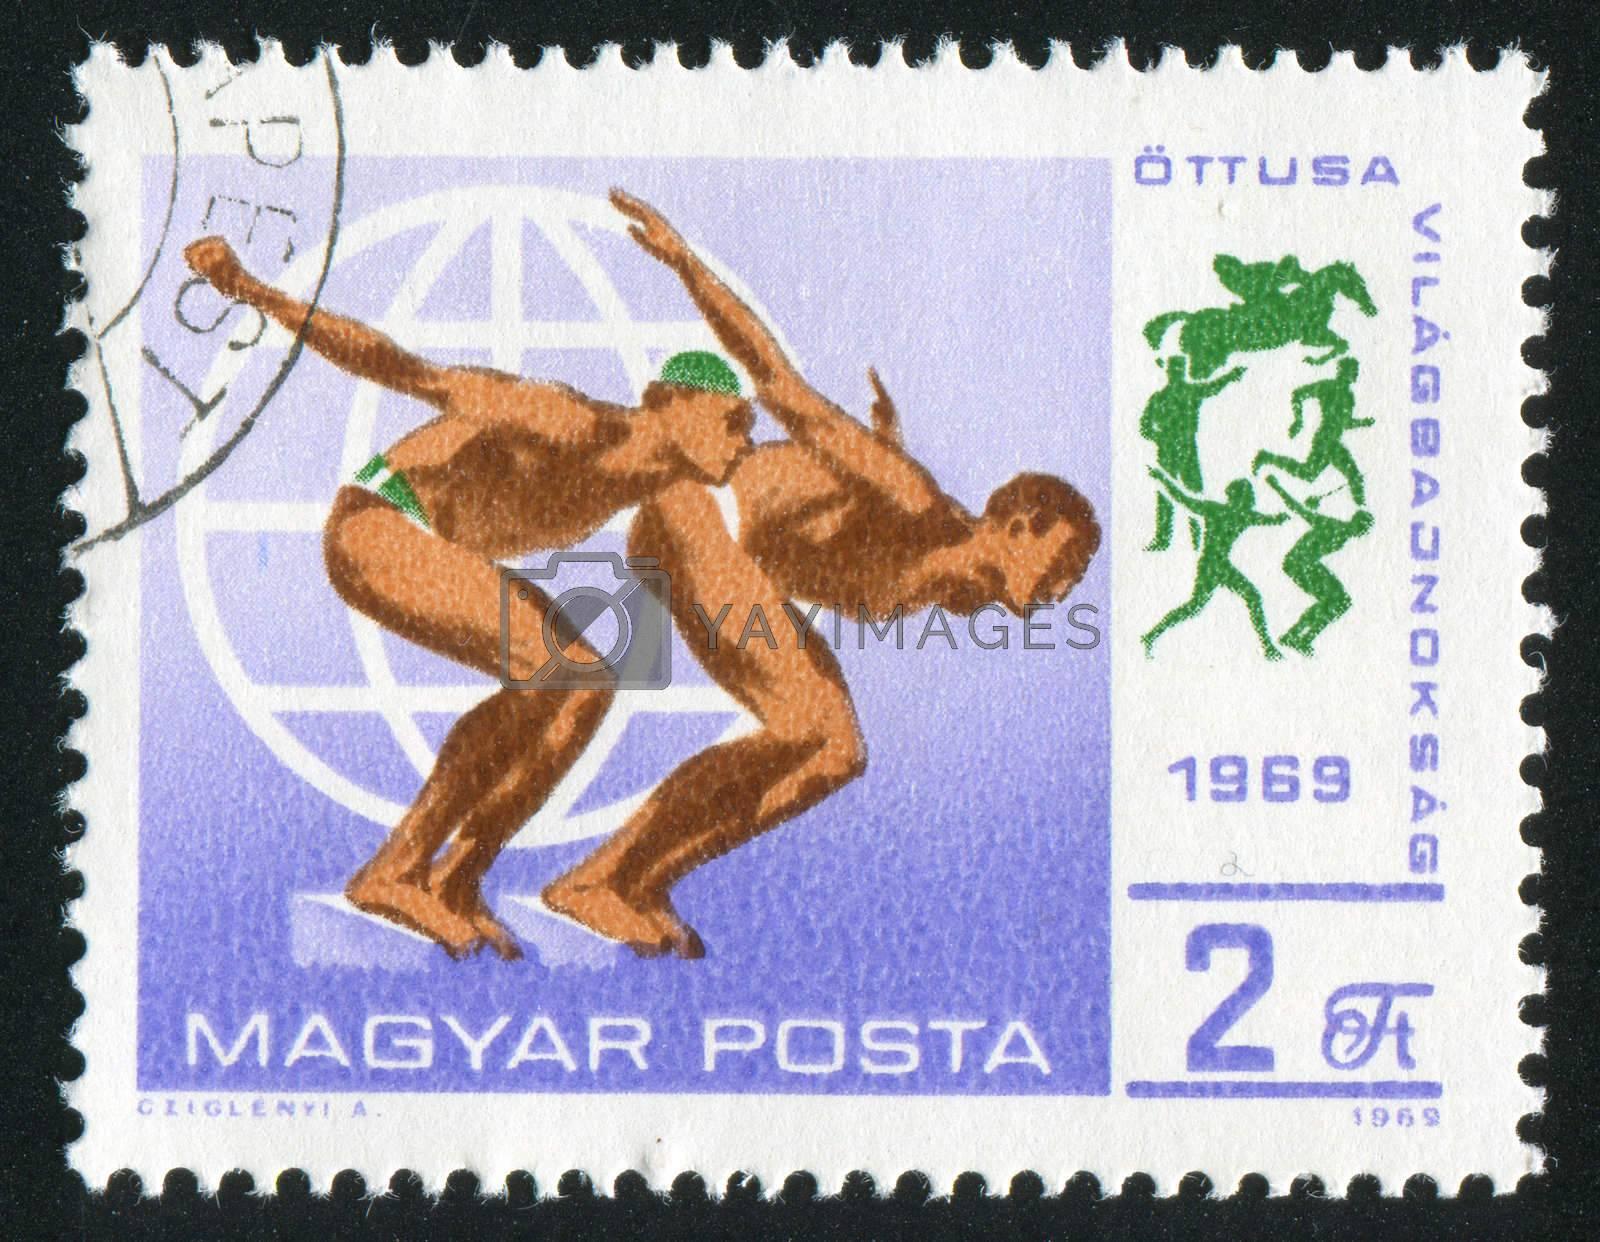 HUNGARY - CIRCA 1969: stamp printed by Hungary, shows swimmer, circa 1969